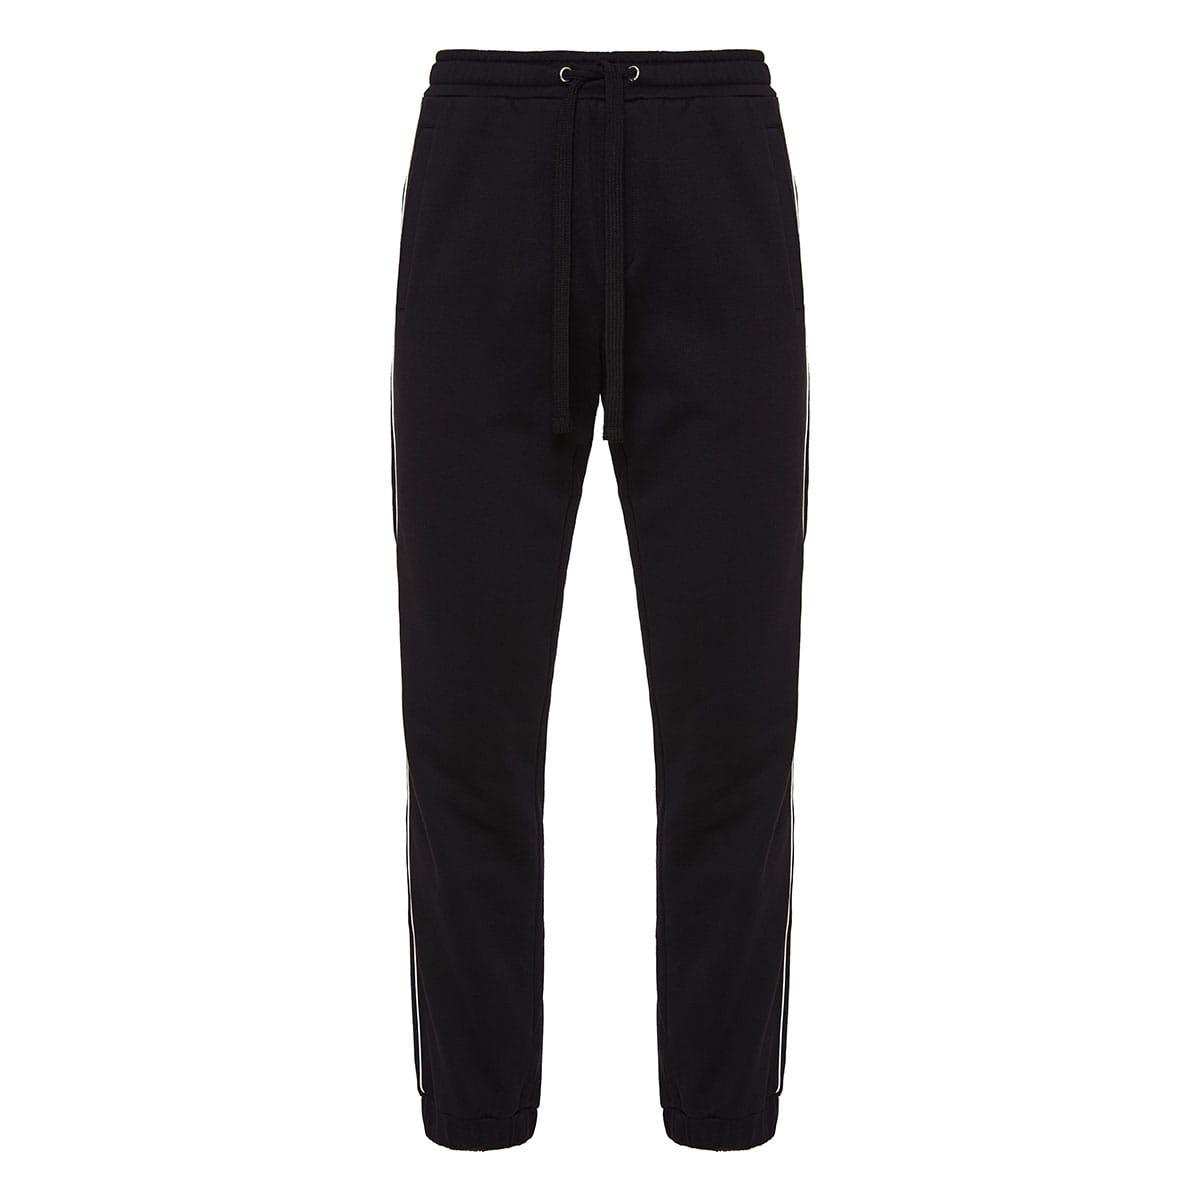 VLTN cotton track trousers